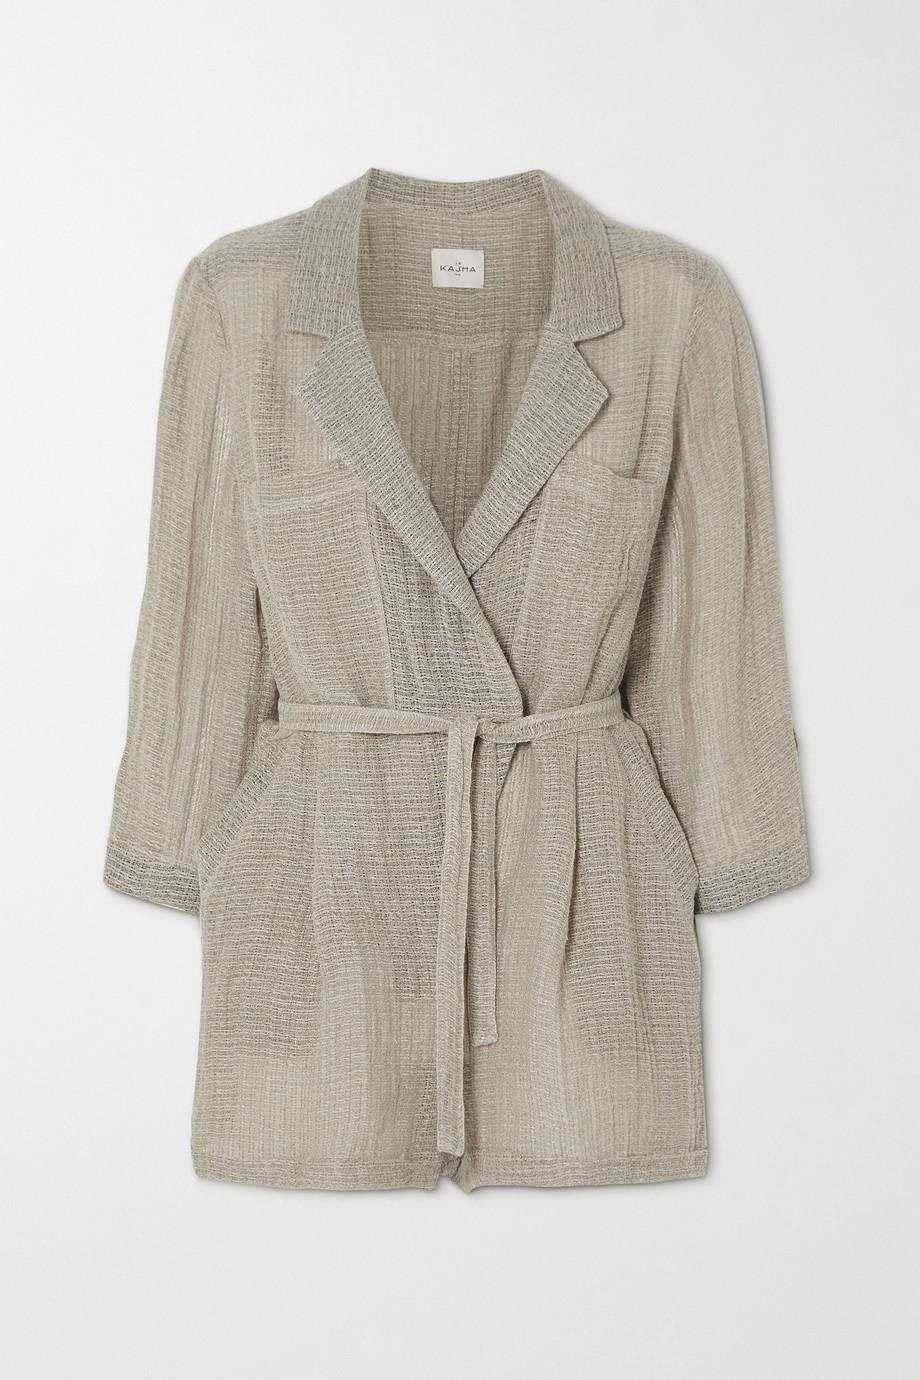 Le Kasha Belted wrap-effect linen playsuit